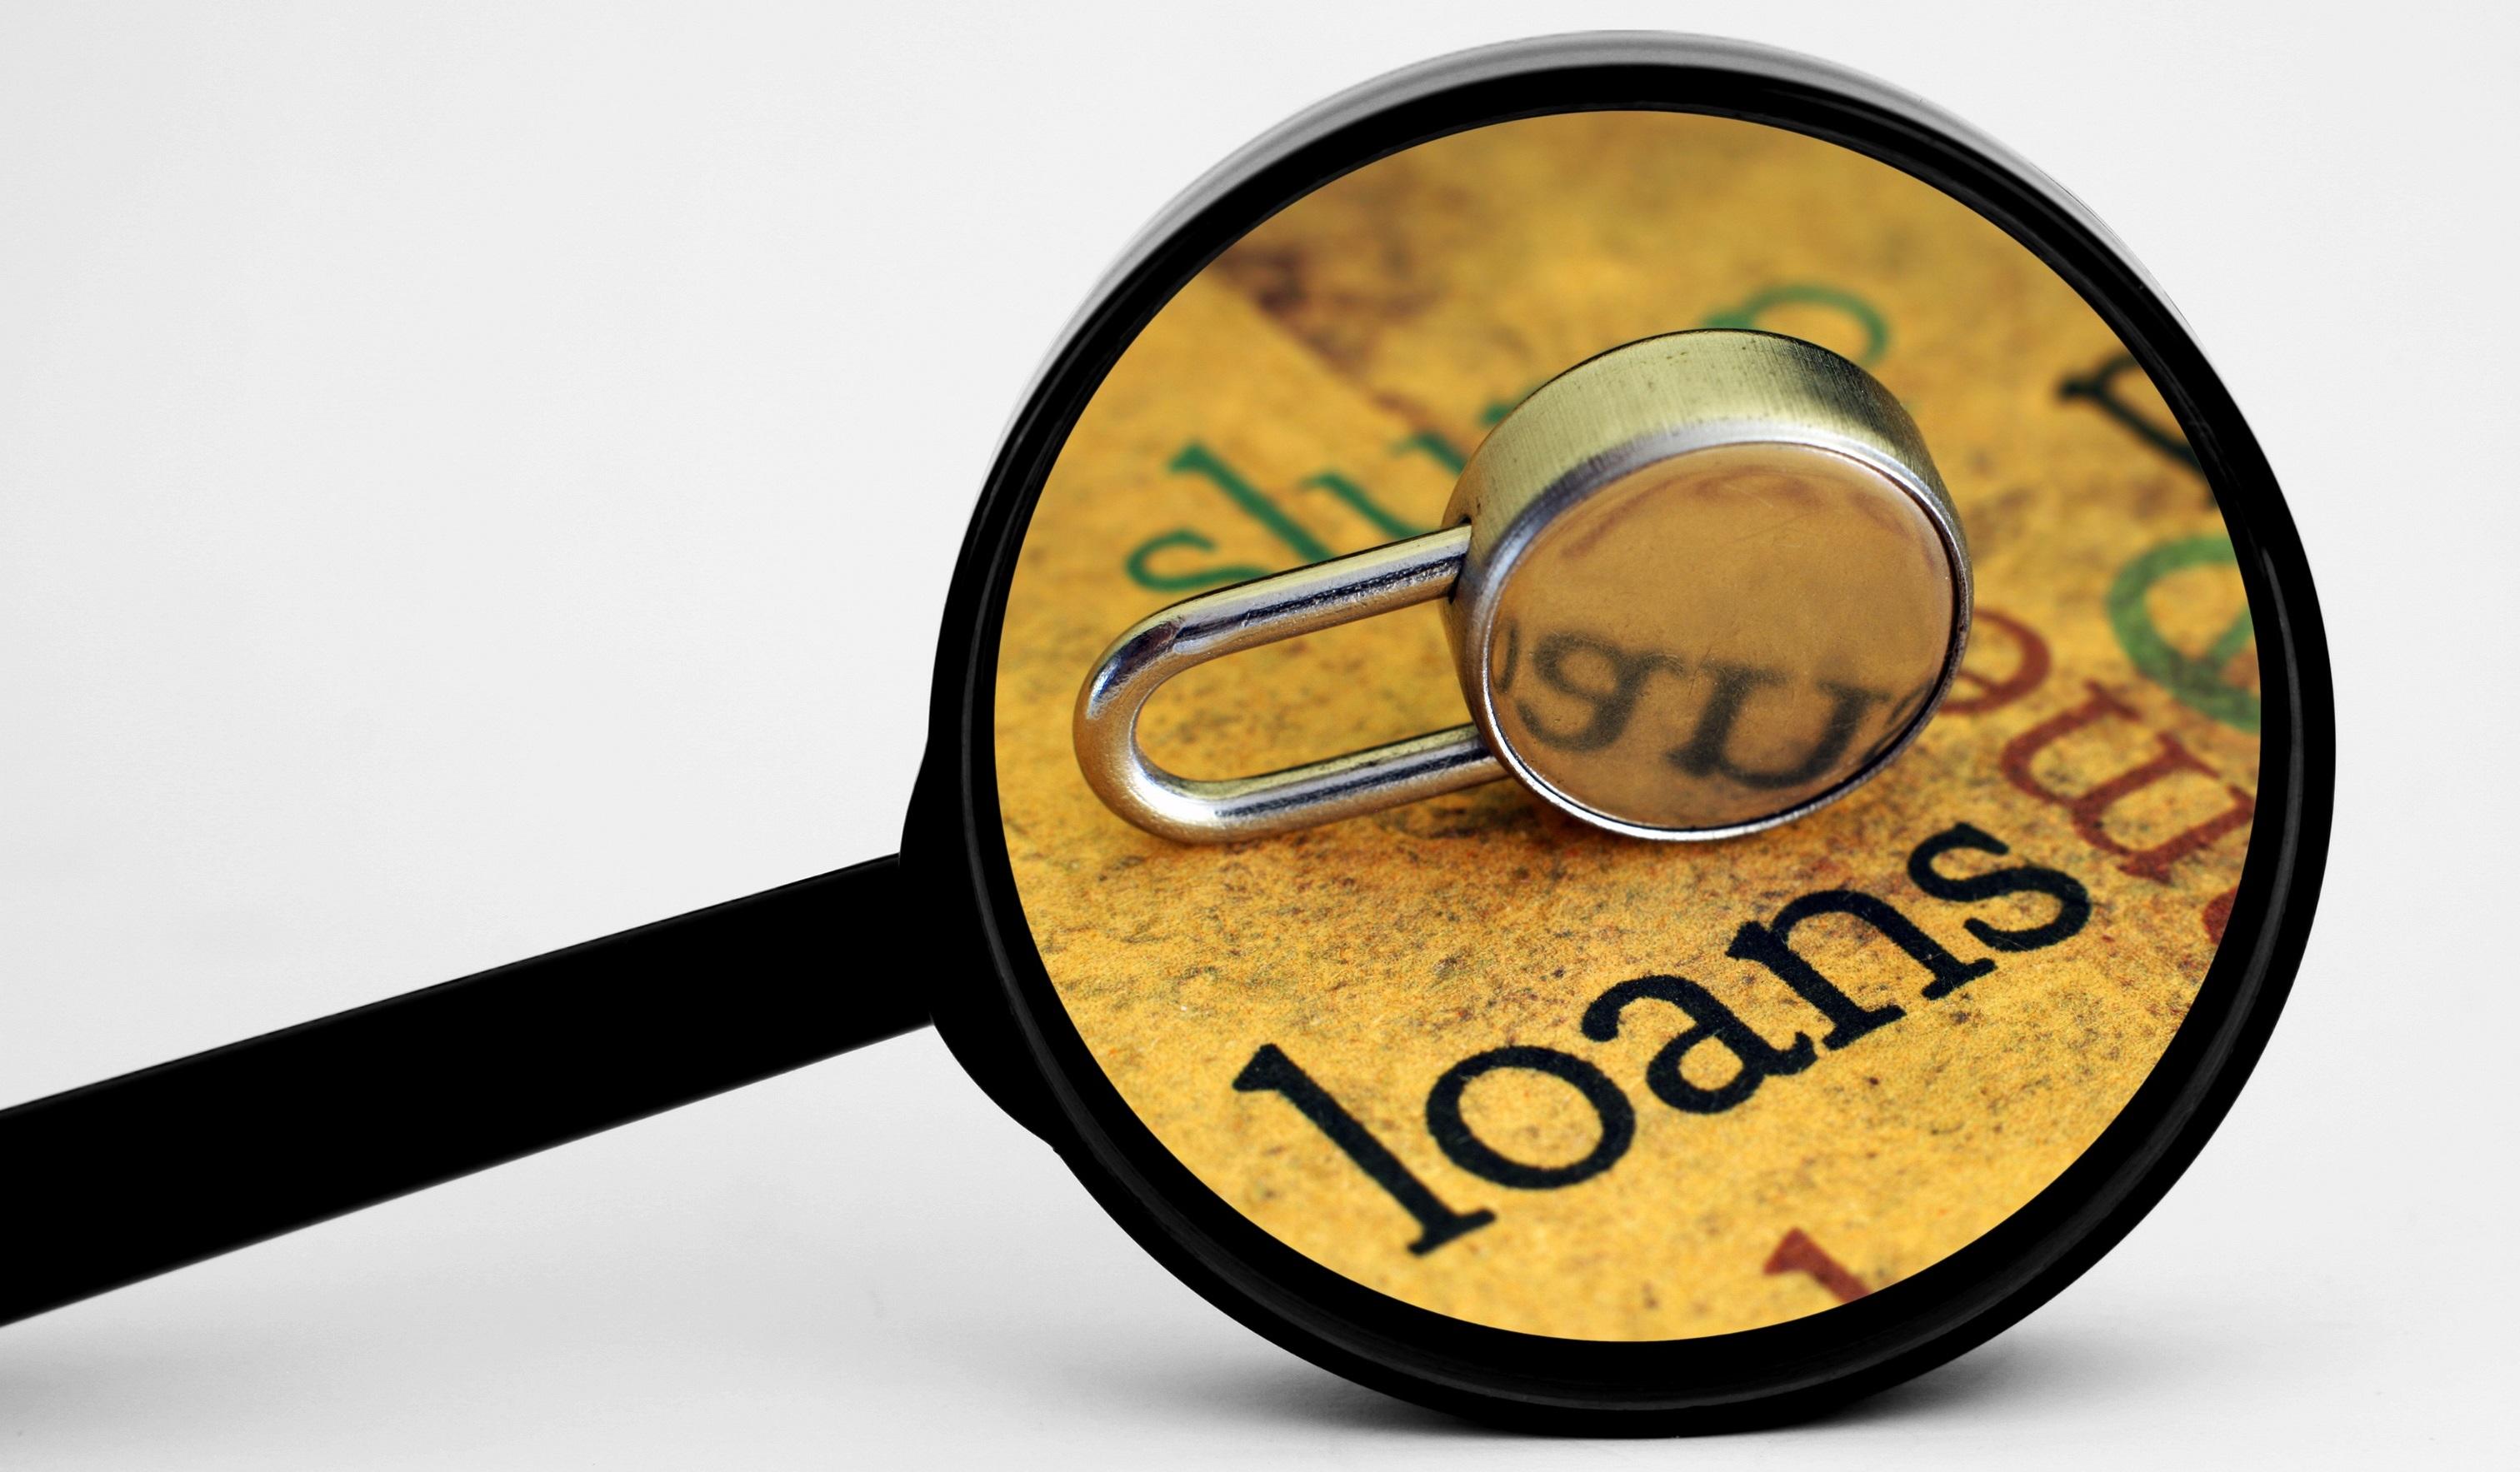 Specialty Programs for Investors